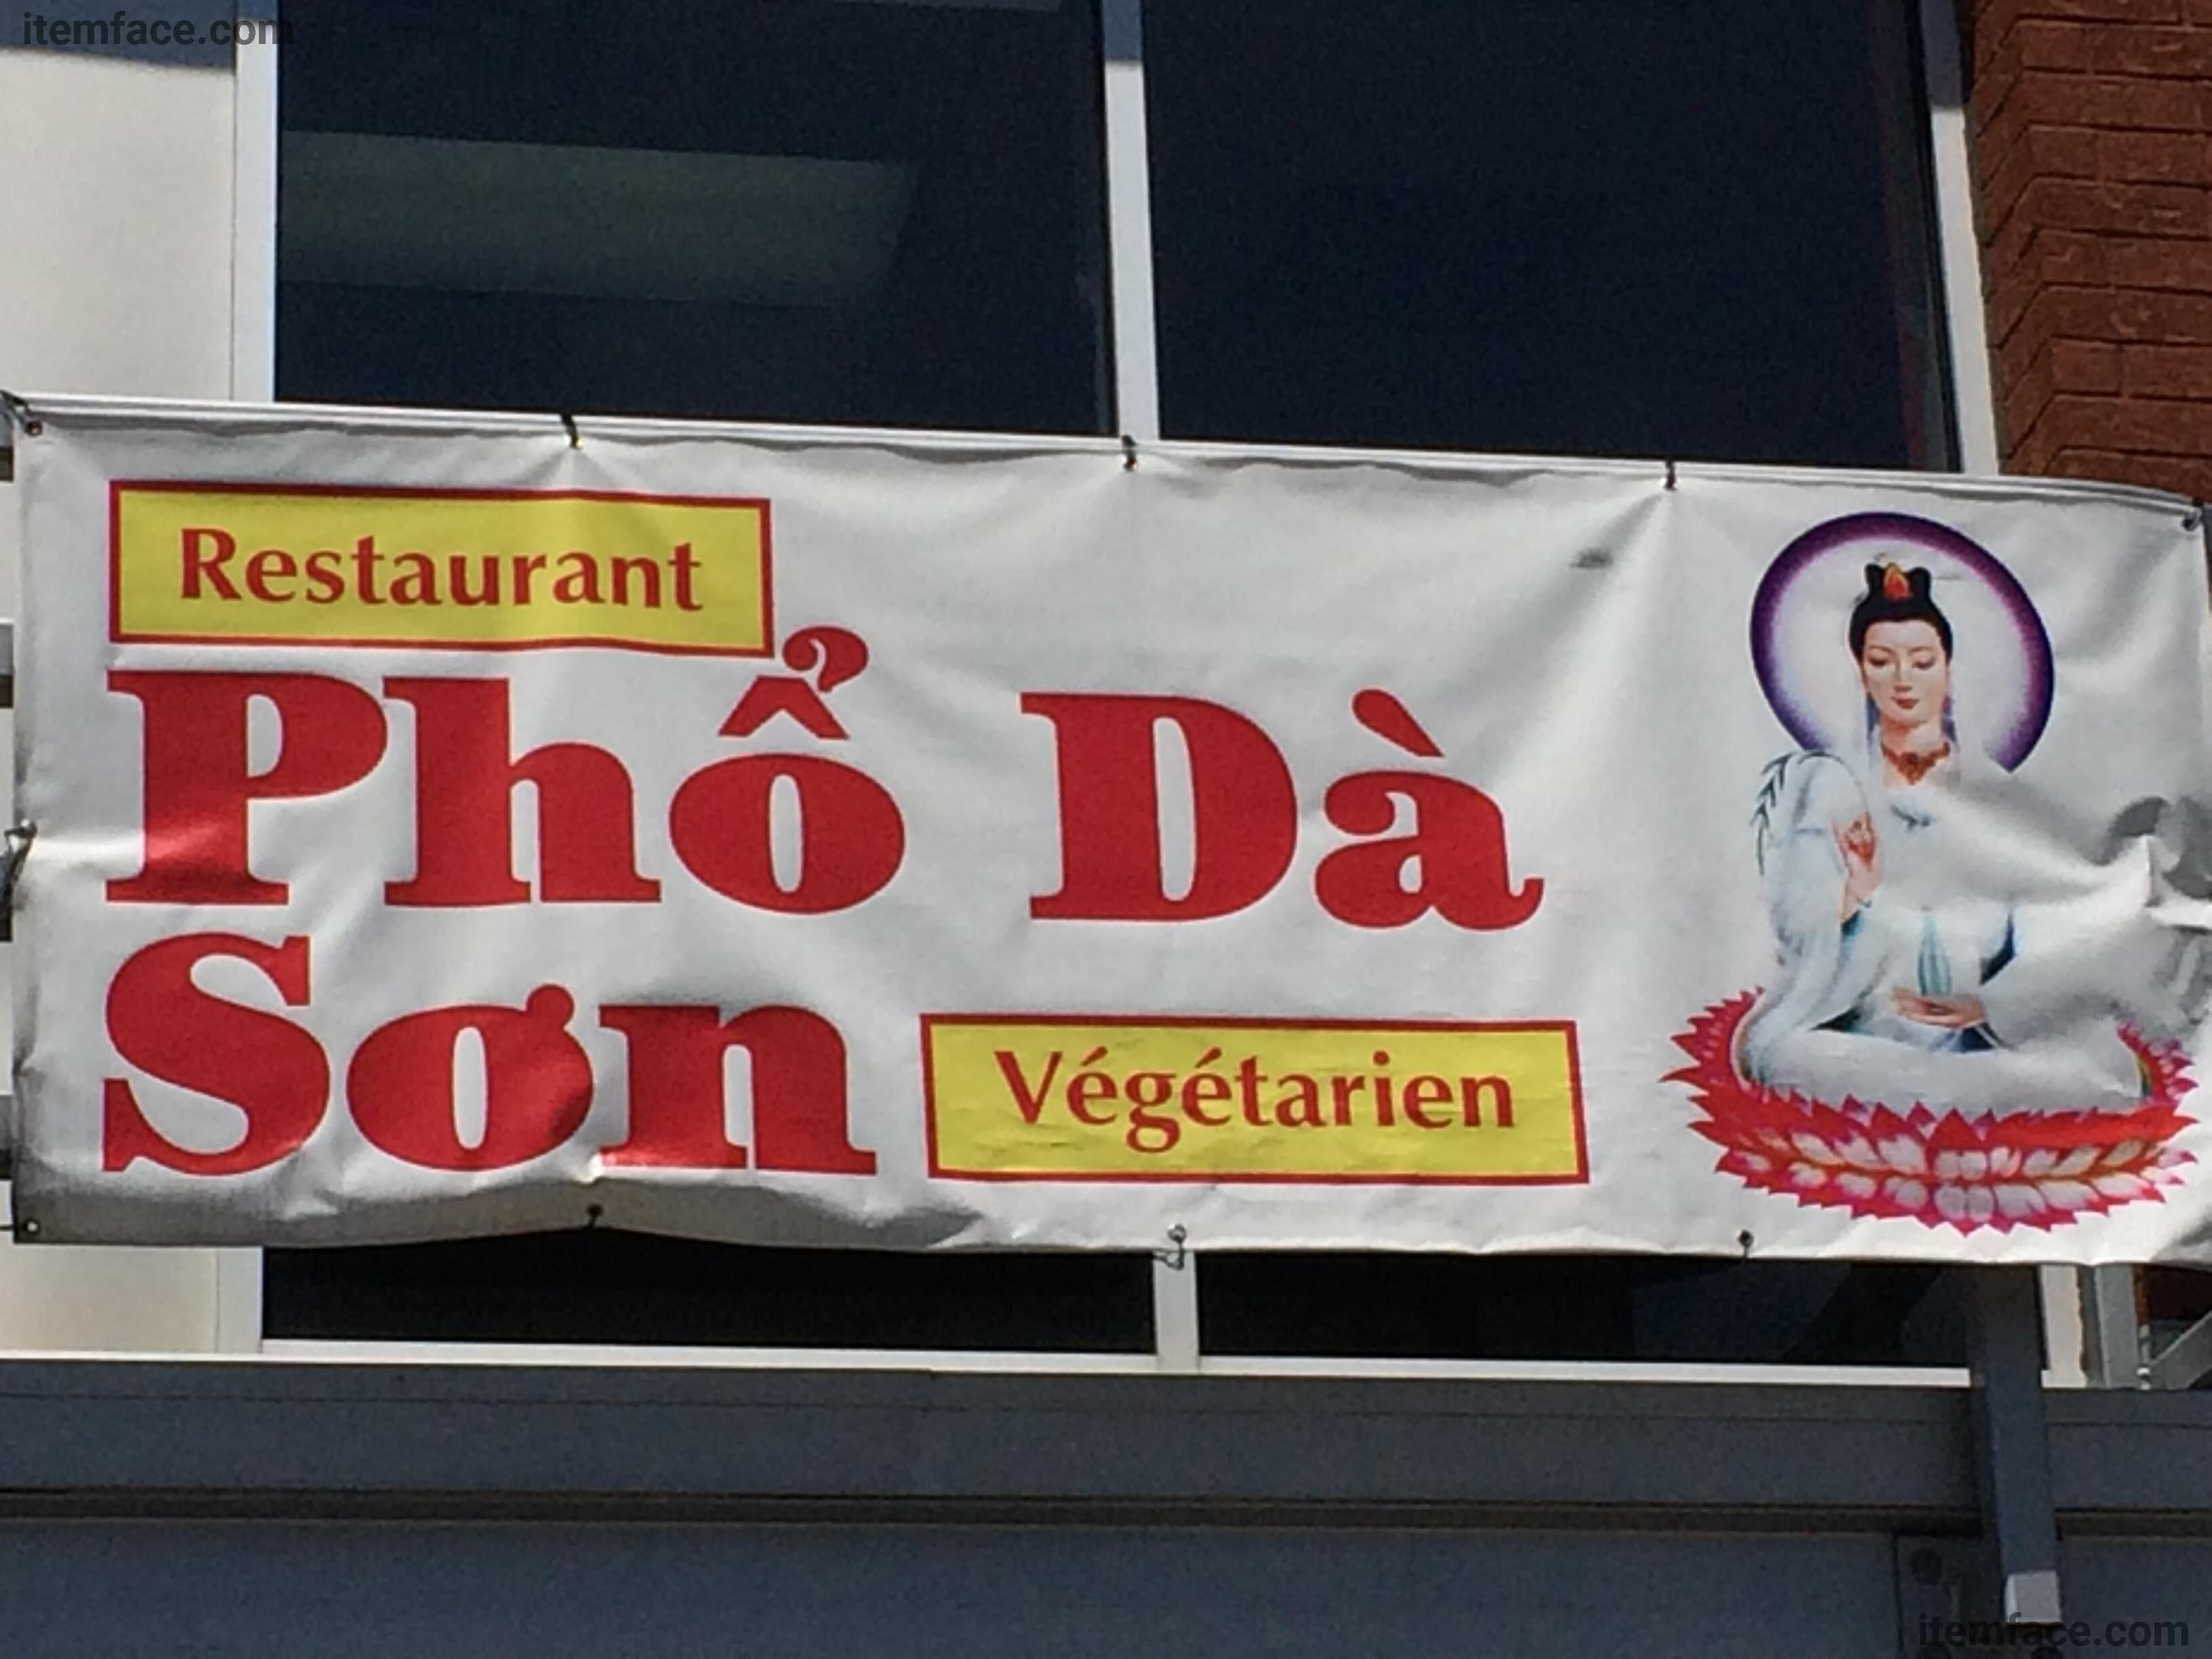 Phổ Đà Sơn Restaurant Végétarien - Restaurant